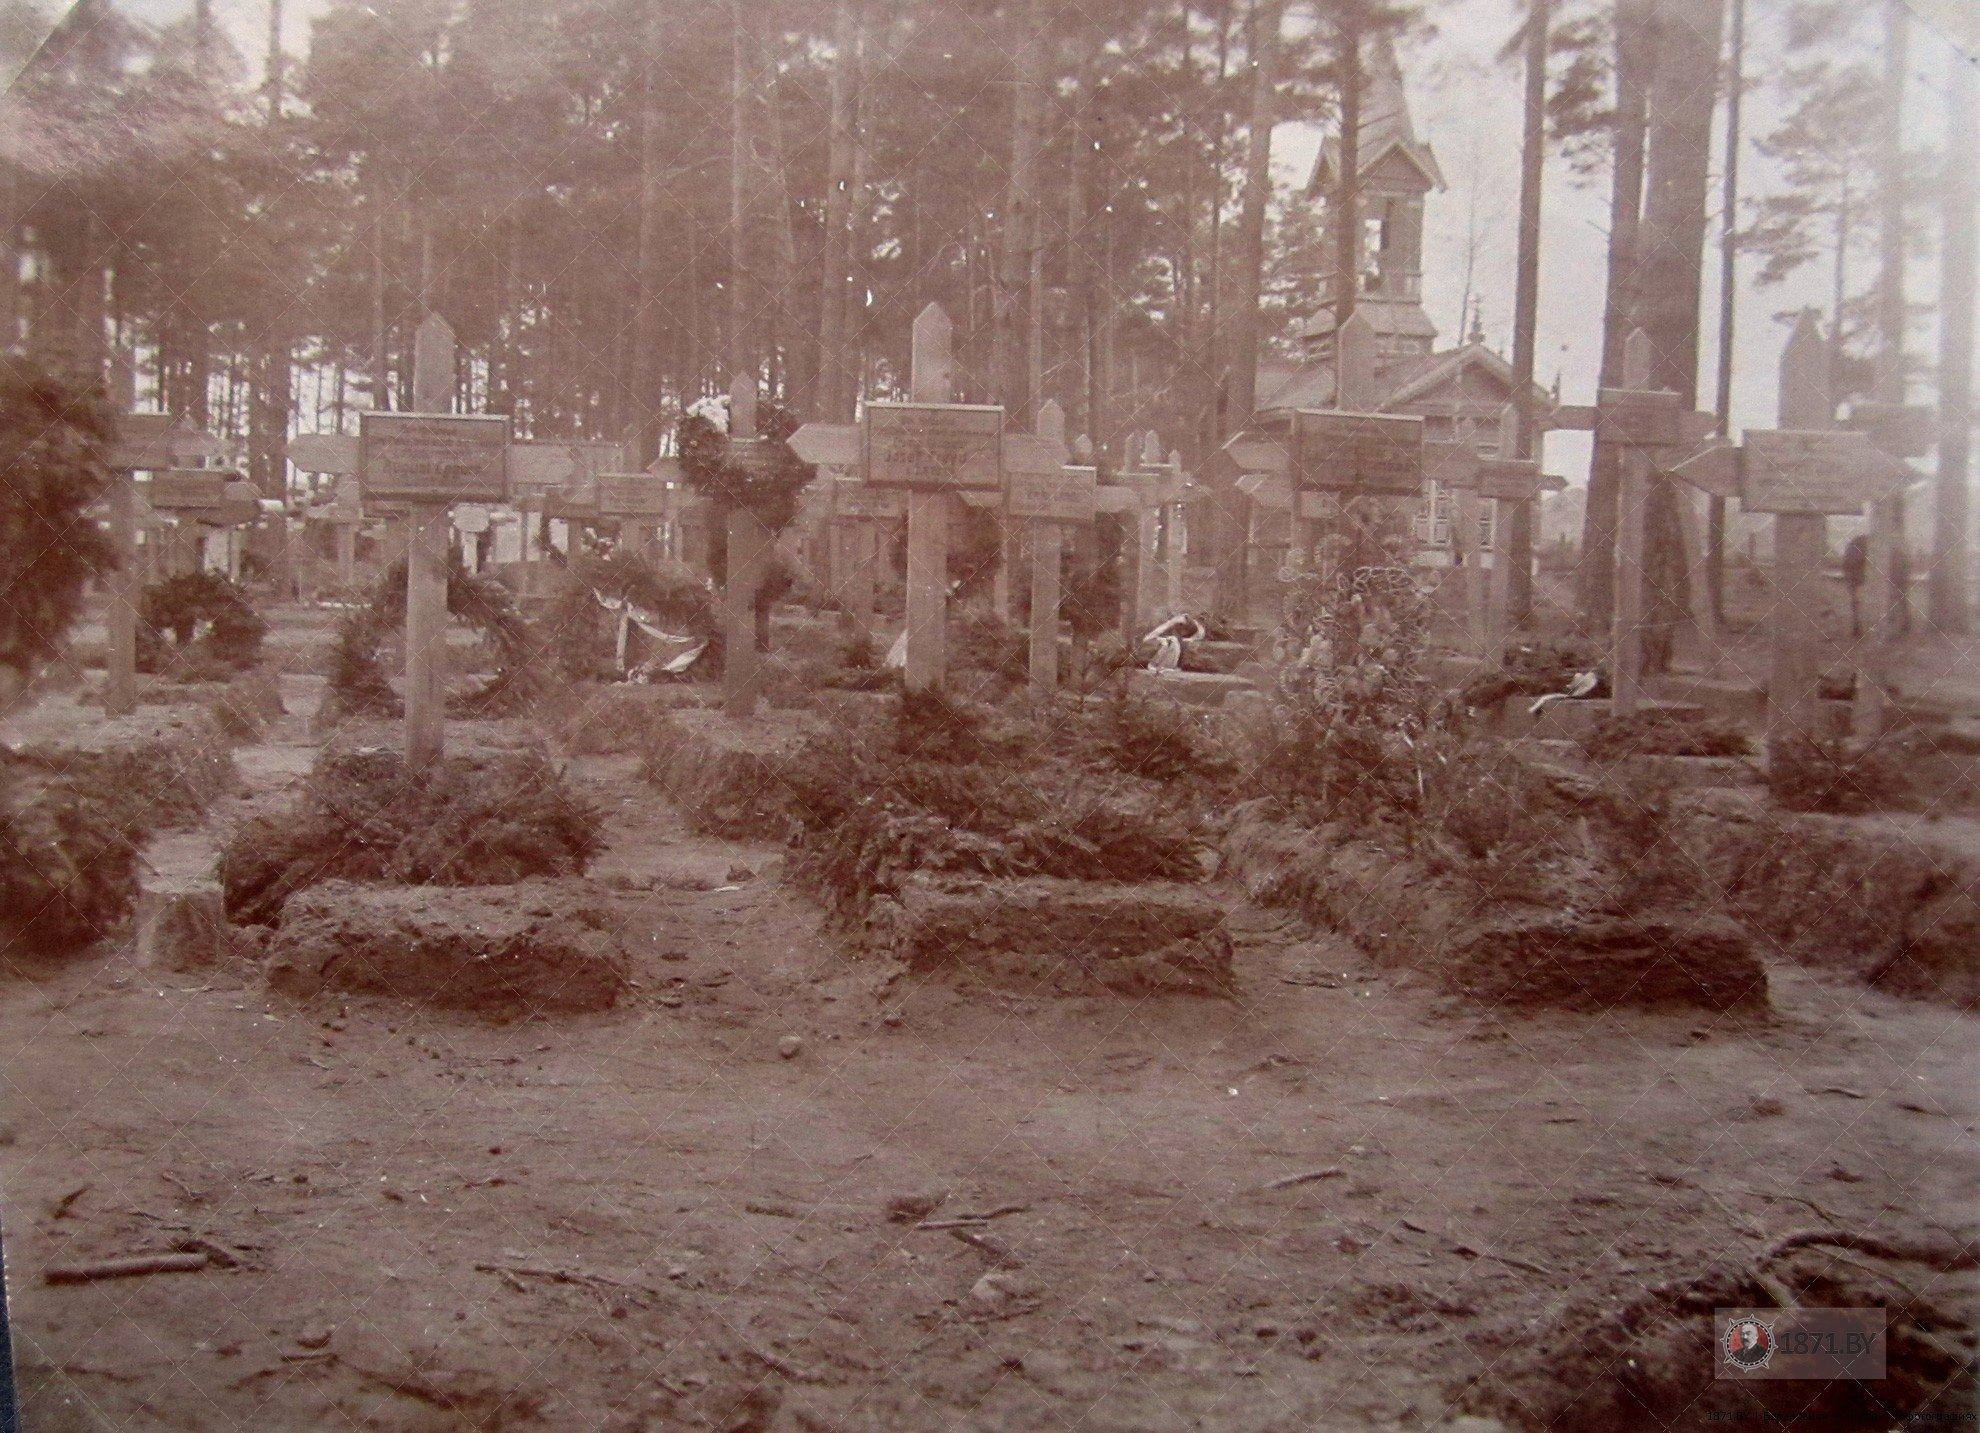 Friedhof in Baranowitschi / Кладбище в Барановичах, 1918